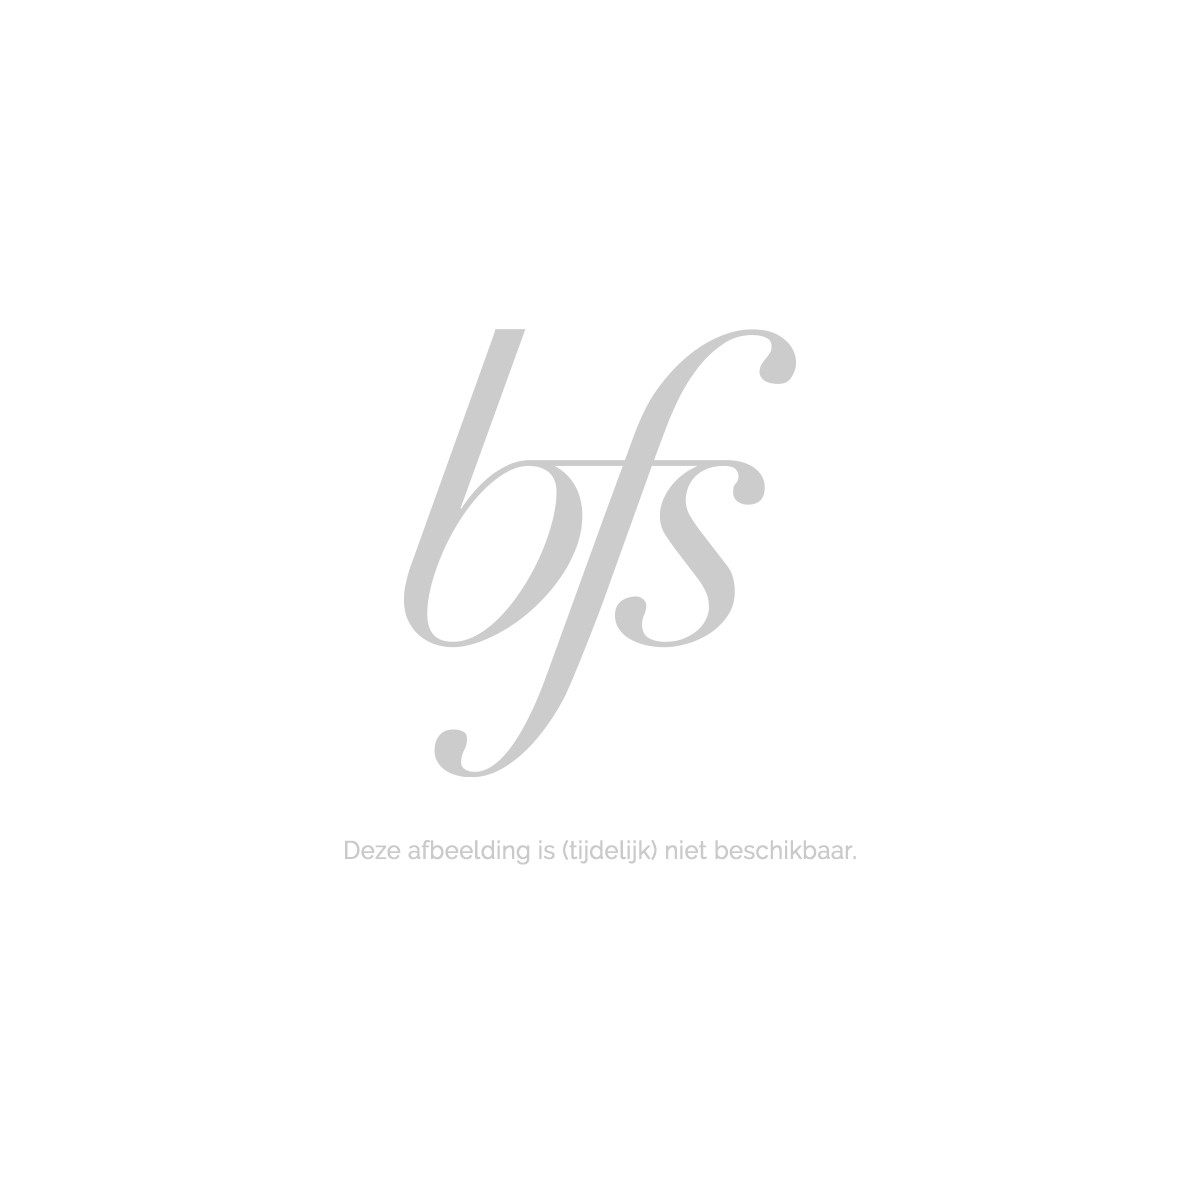 Marc Jacobs Daisy Love Eau De Toilette Spray 30 Ml